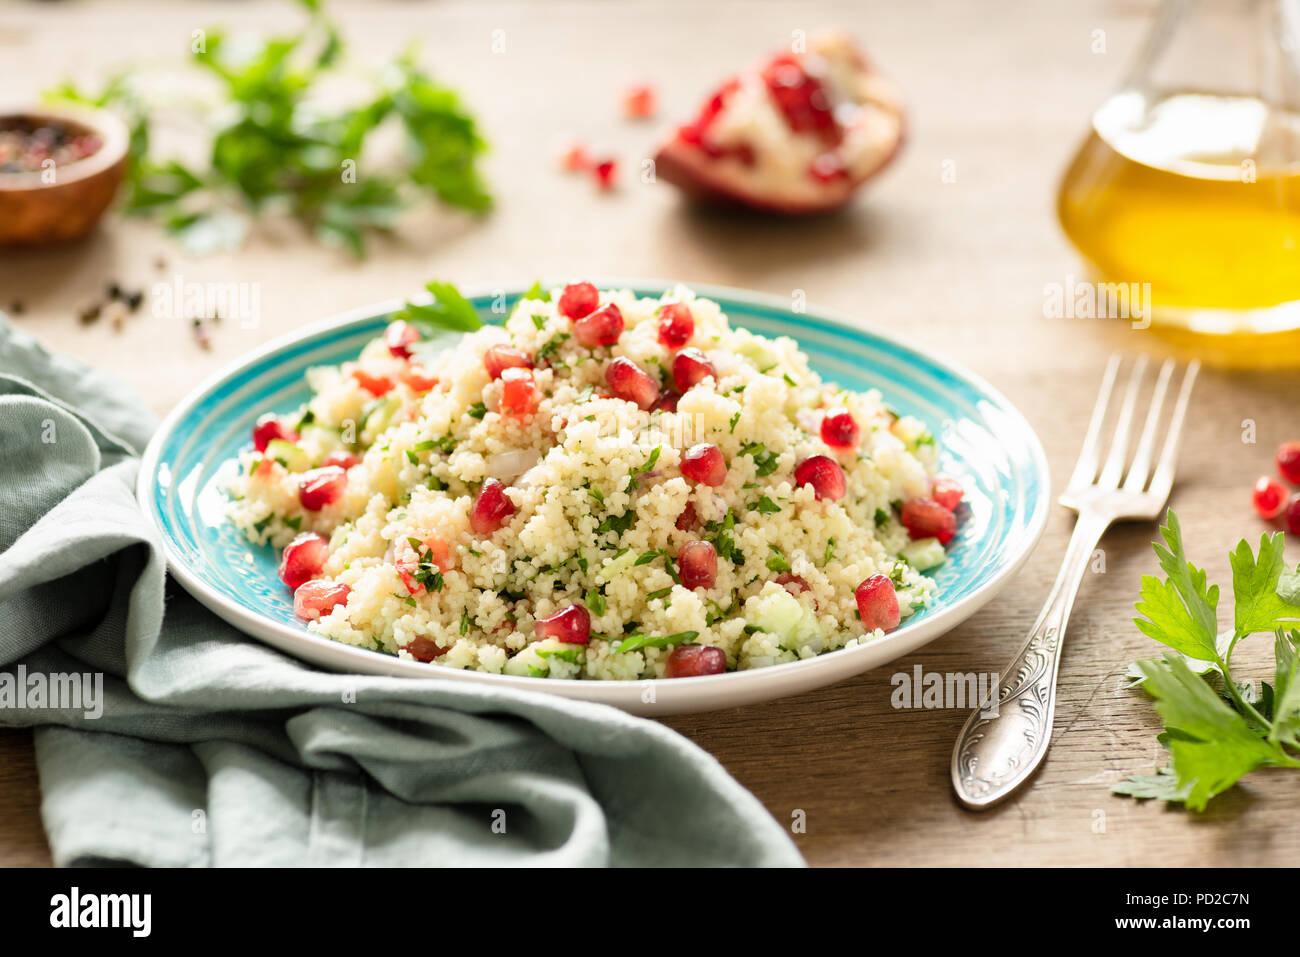 Tabbouleh, Naher Osten couscous Salat mit Granatapfel, Petersilie, Gurken auf authentischen türkis Platte. Vegetarische Mahlzeit Stockbild